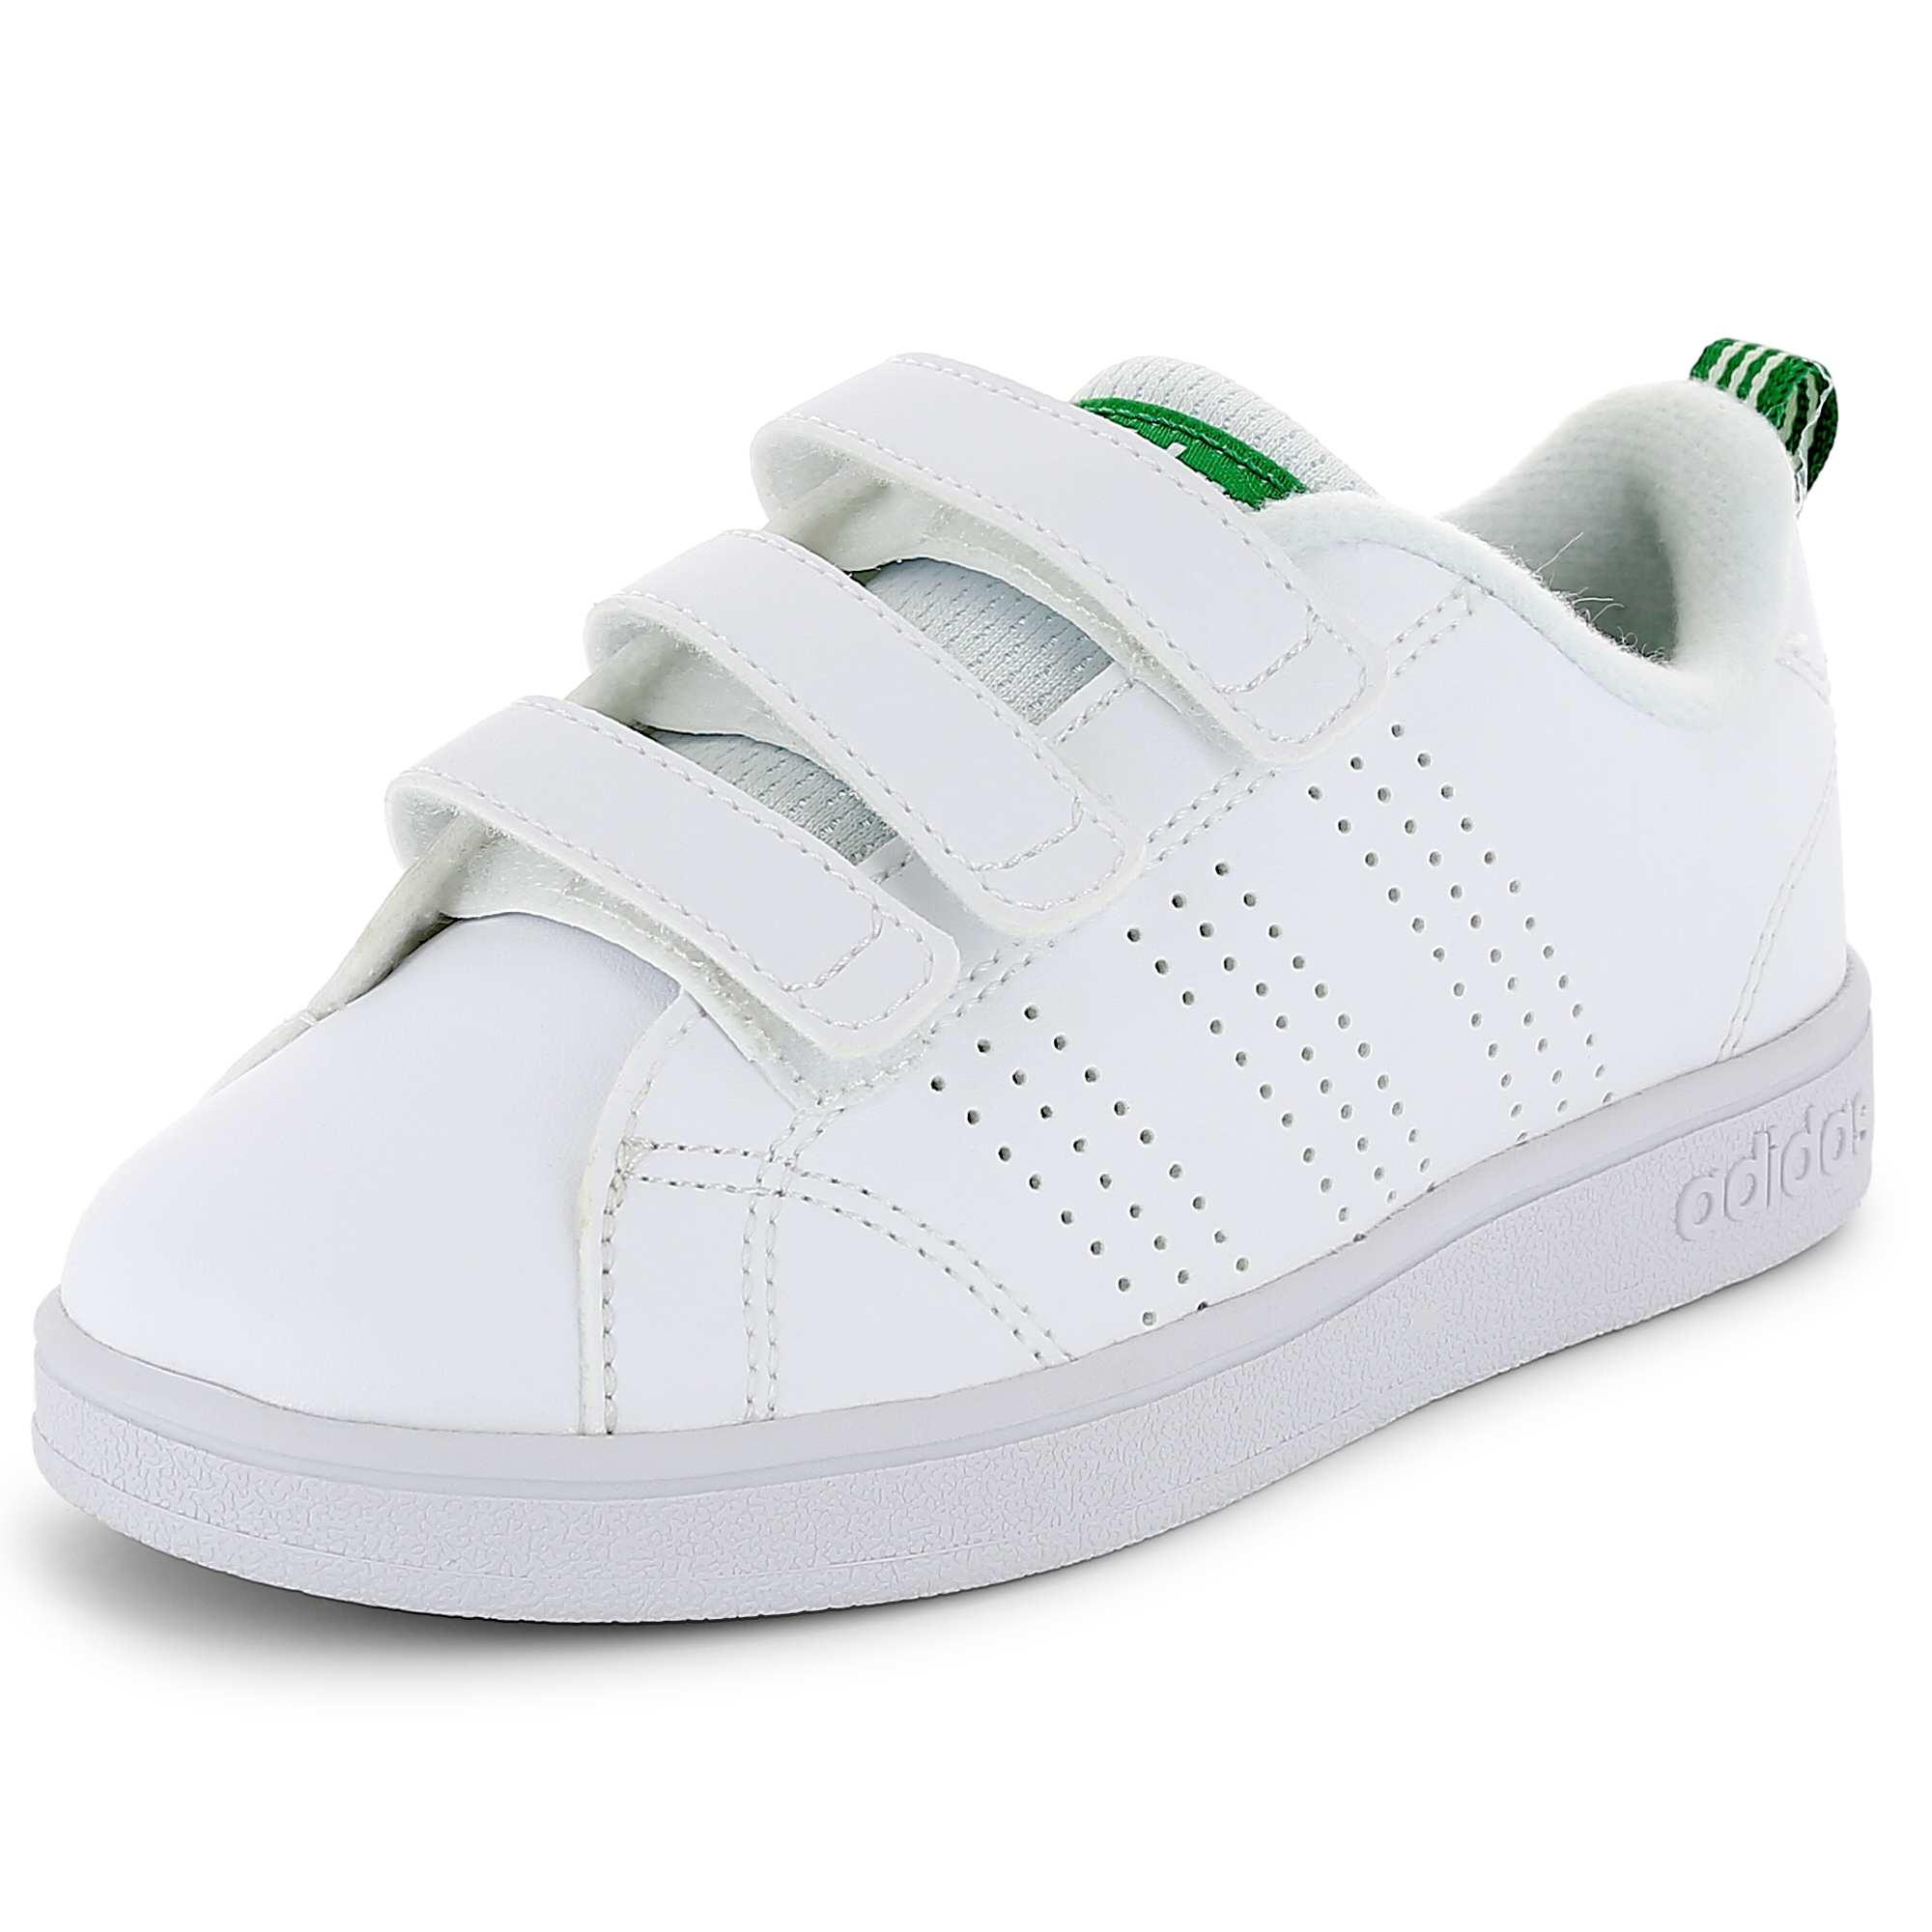 chaussure adidas scratch